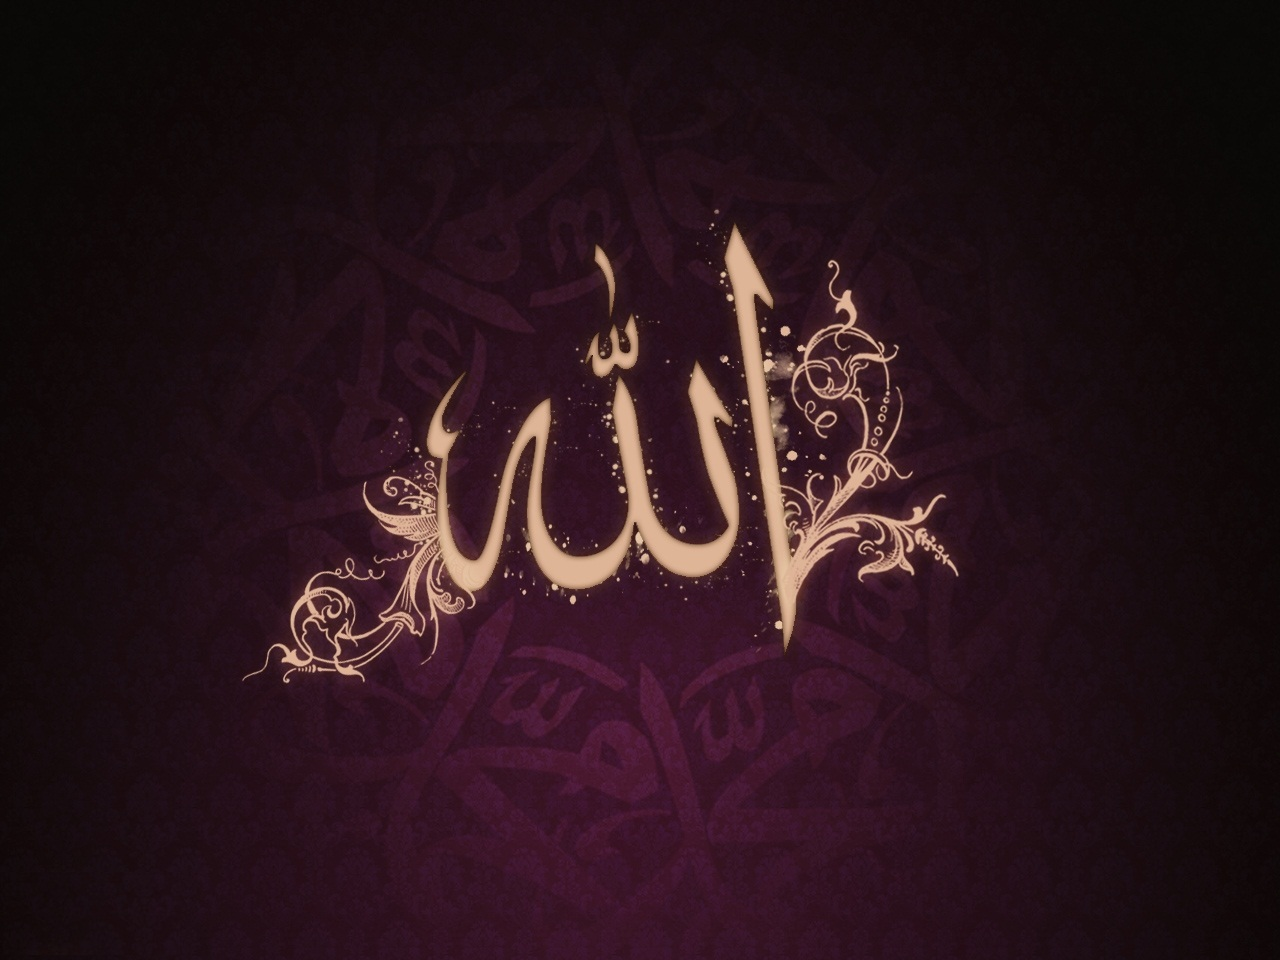 Bhagwan Ji Lord Allah HD Wallpapers 1280x960